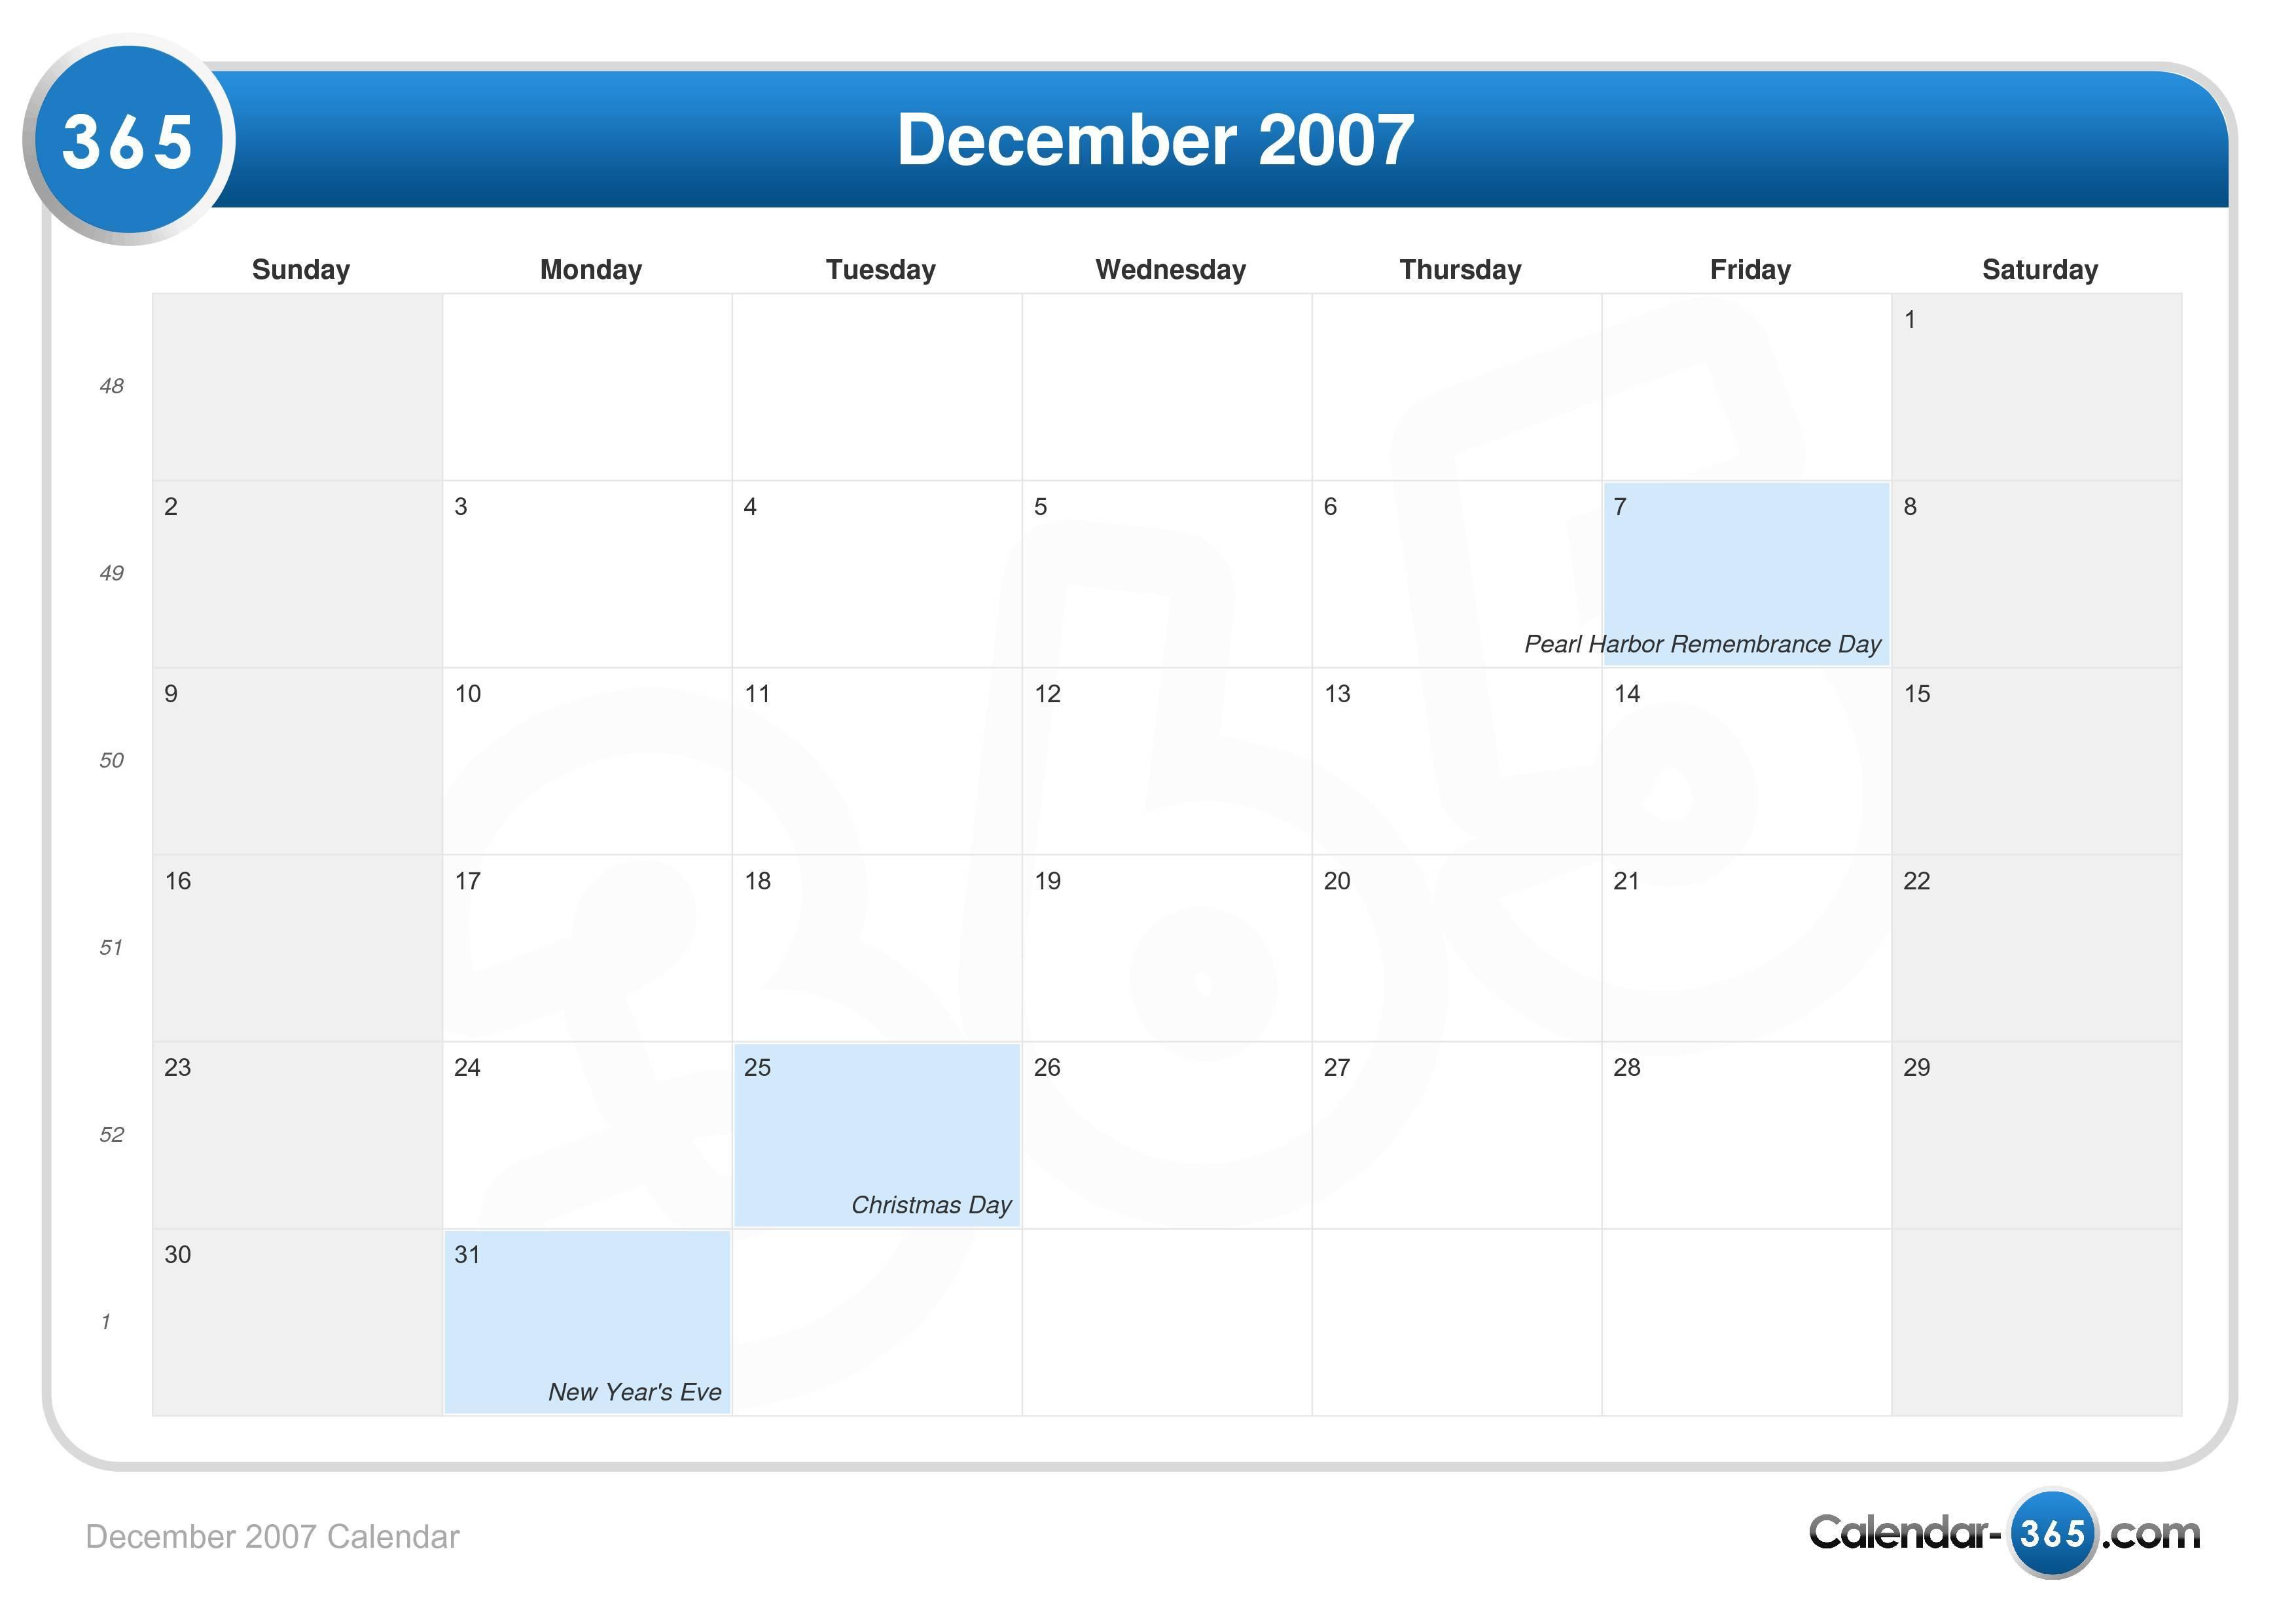 December 2007 Calendar